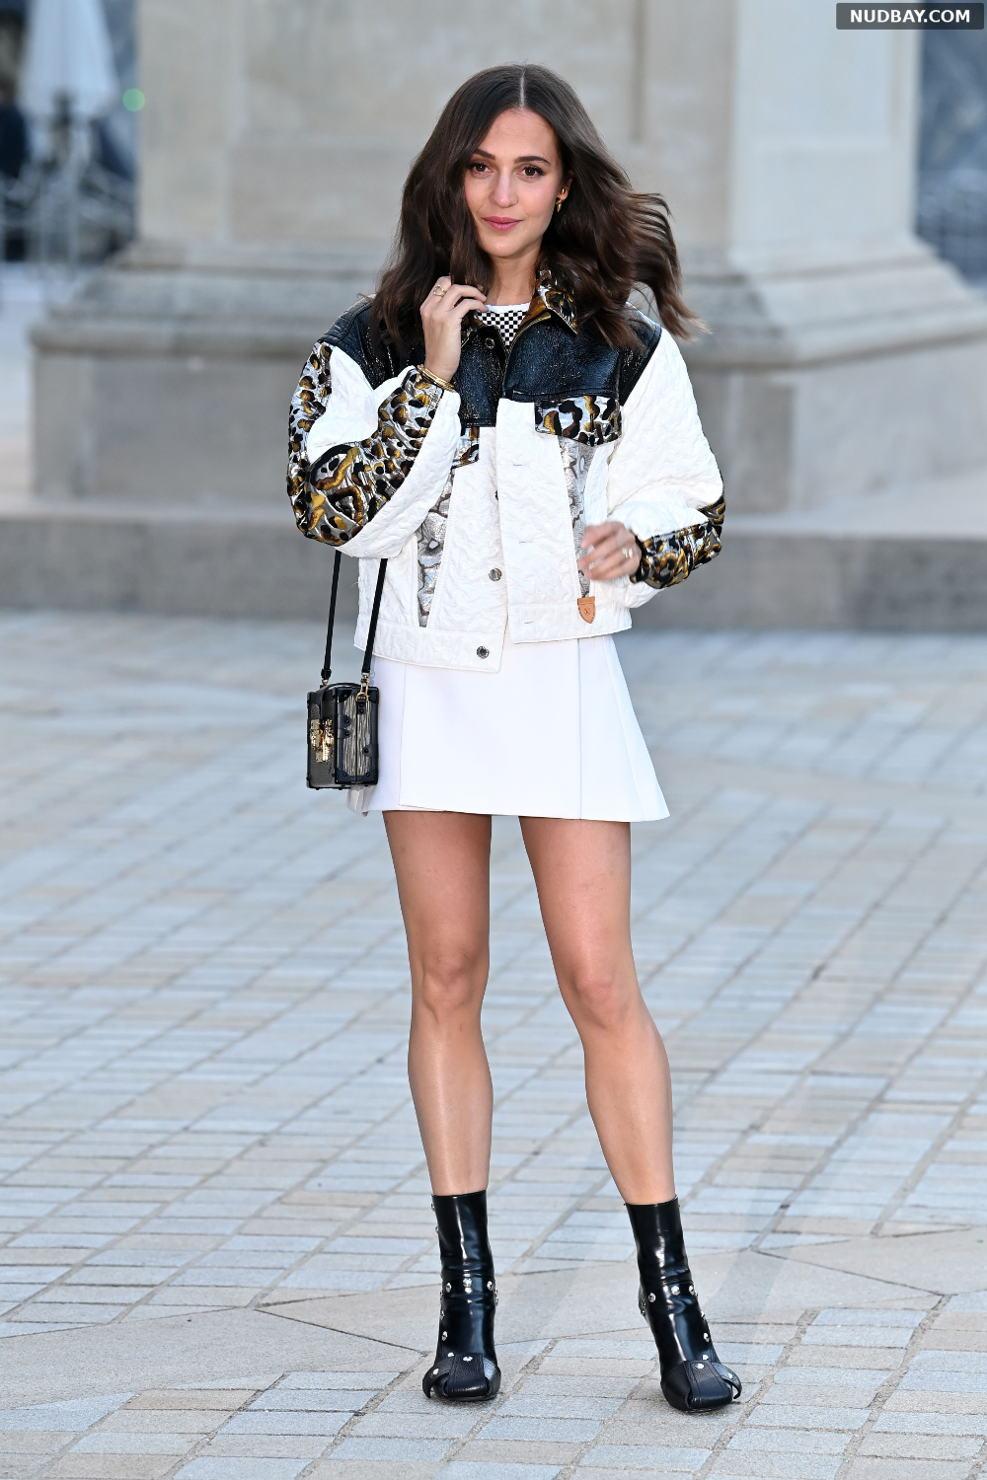 Alicia Vikander at Louis Vuitton show during Paris Fashion Week Oct 05 2021